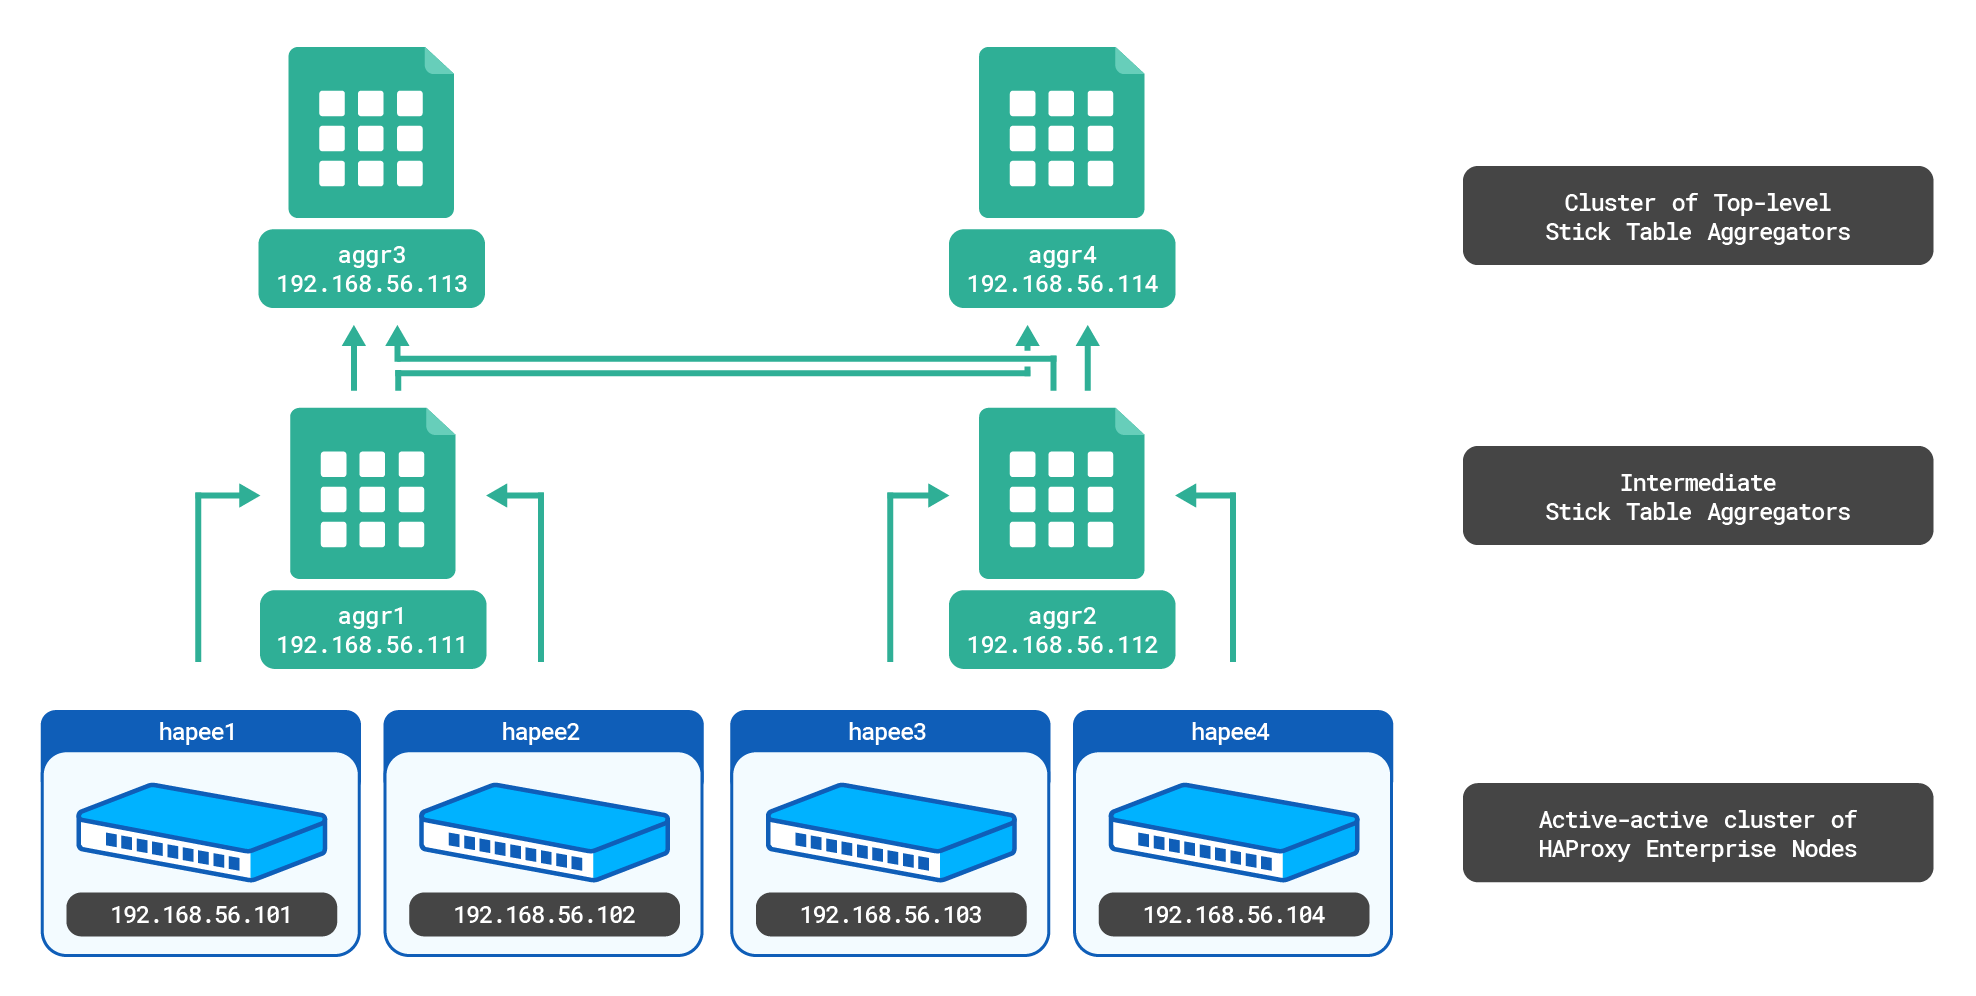 https://cdn.haproxy.com/documentation/hapee/1-8r2/assets/cluster-wide-tracking-ha-setup-3e25d8ecf8c45676e4240bfd3064aa1f880aec0f81fe28afeaf9cd0516086fd7.png